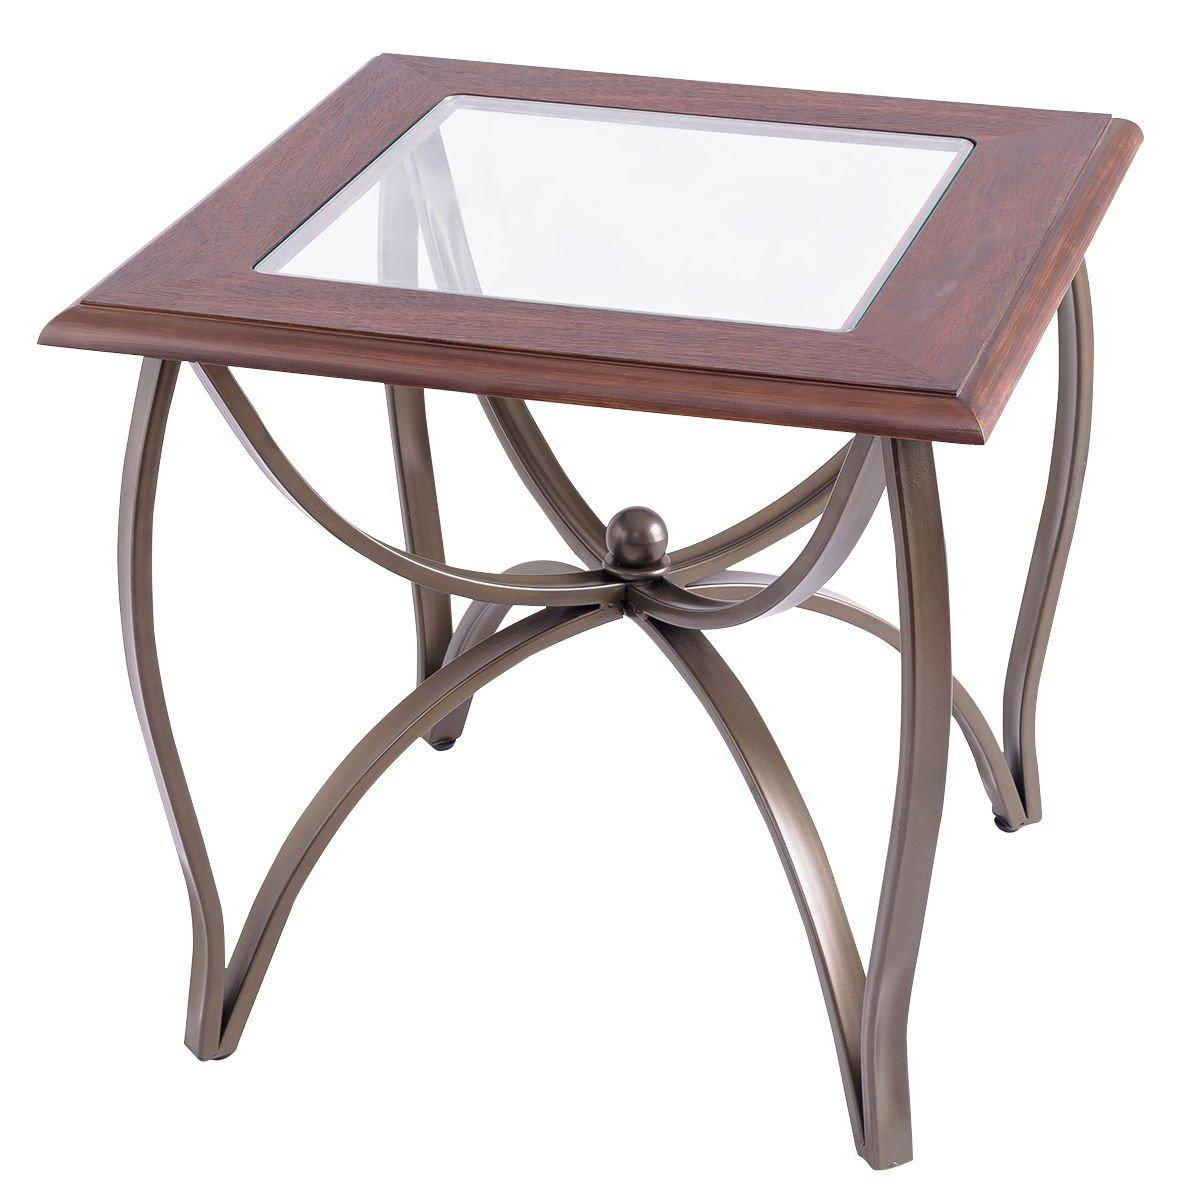 3 Pcs Elegant Wood Glass Coffee Table Set